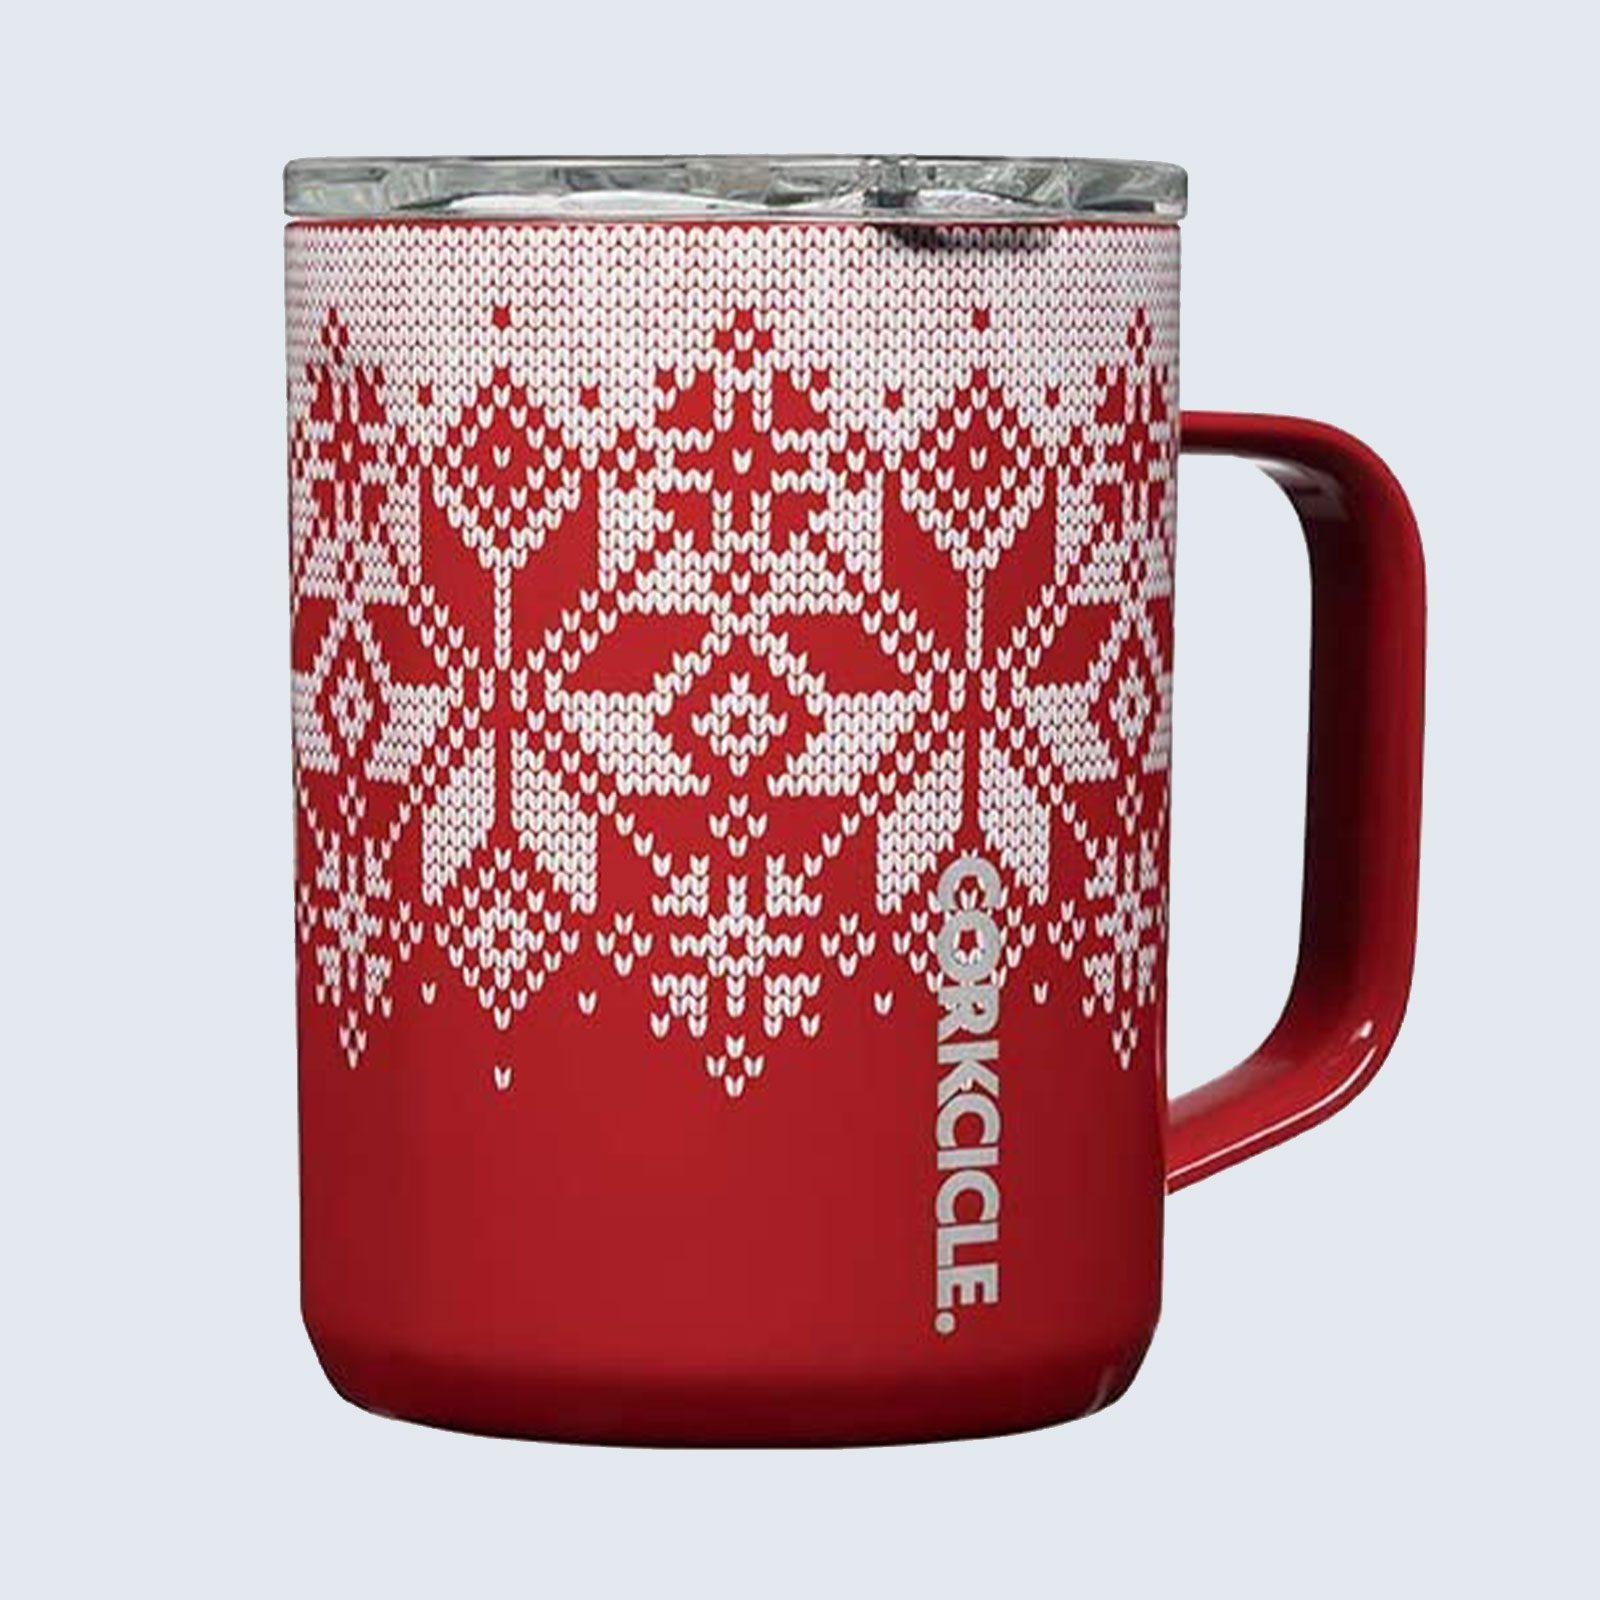 Corkcicle 16 Ounce Triple-Insulated Coffee Mug